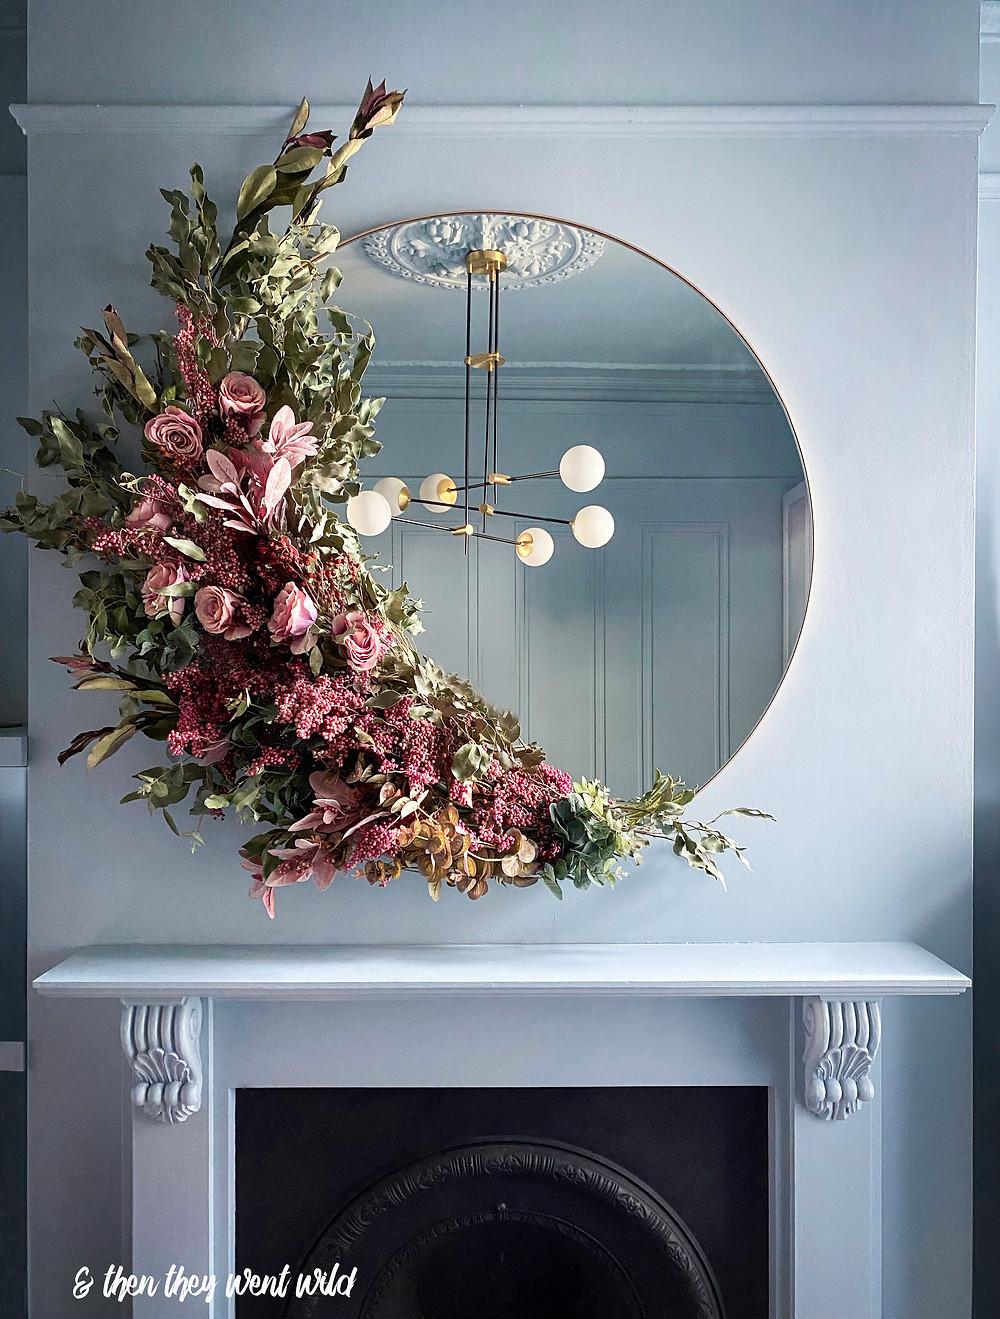 interior design masters nicki bamford-bowes easter styling